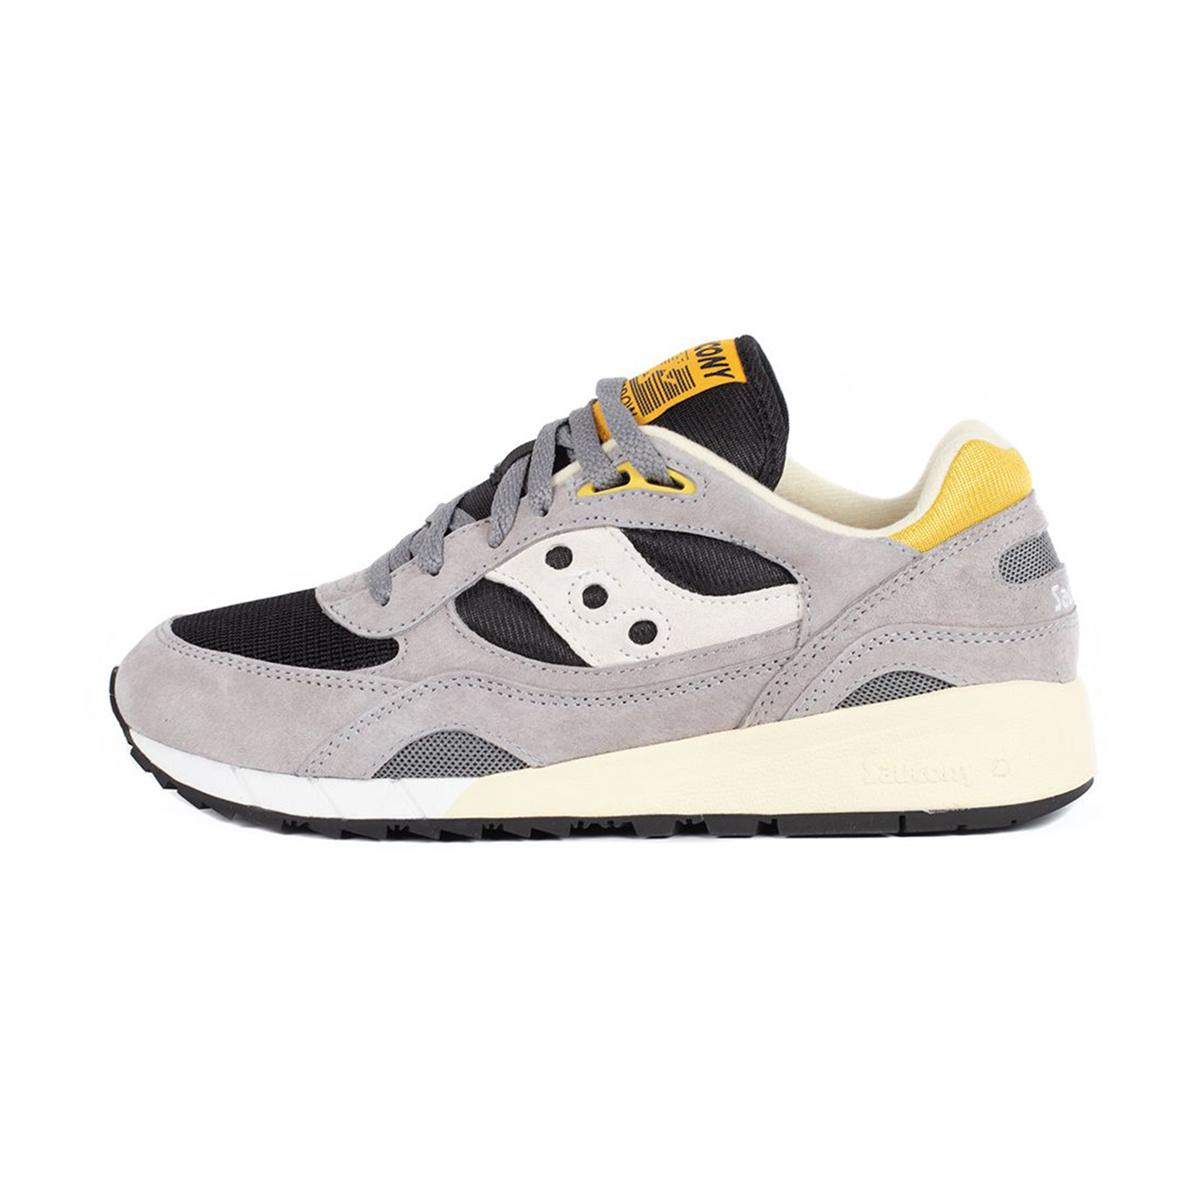 Saucony Shadow 6000 (Grey/Black/Yellow) S70441-21